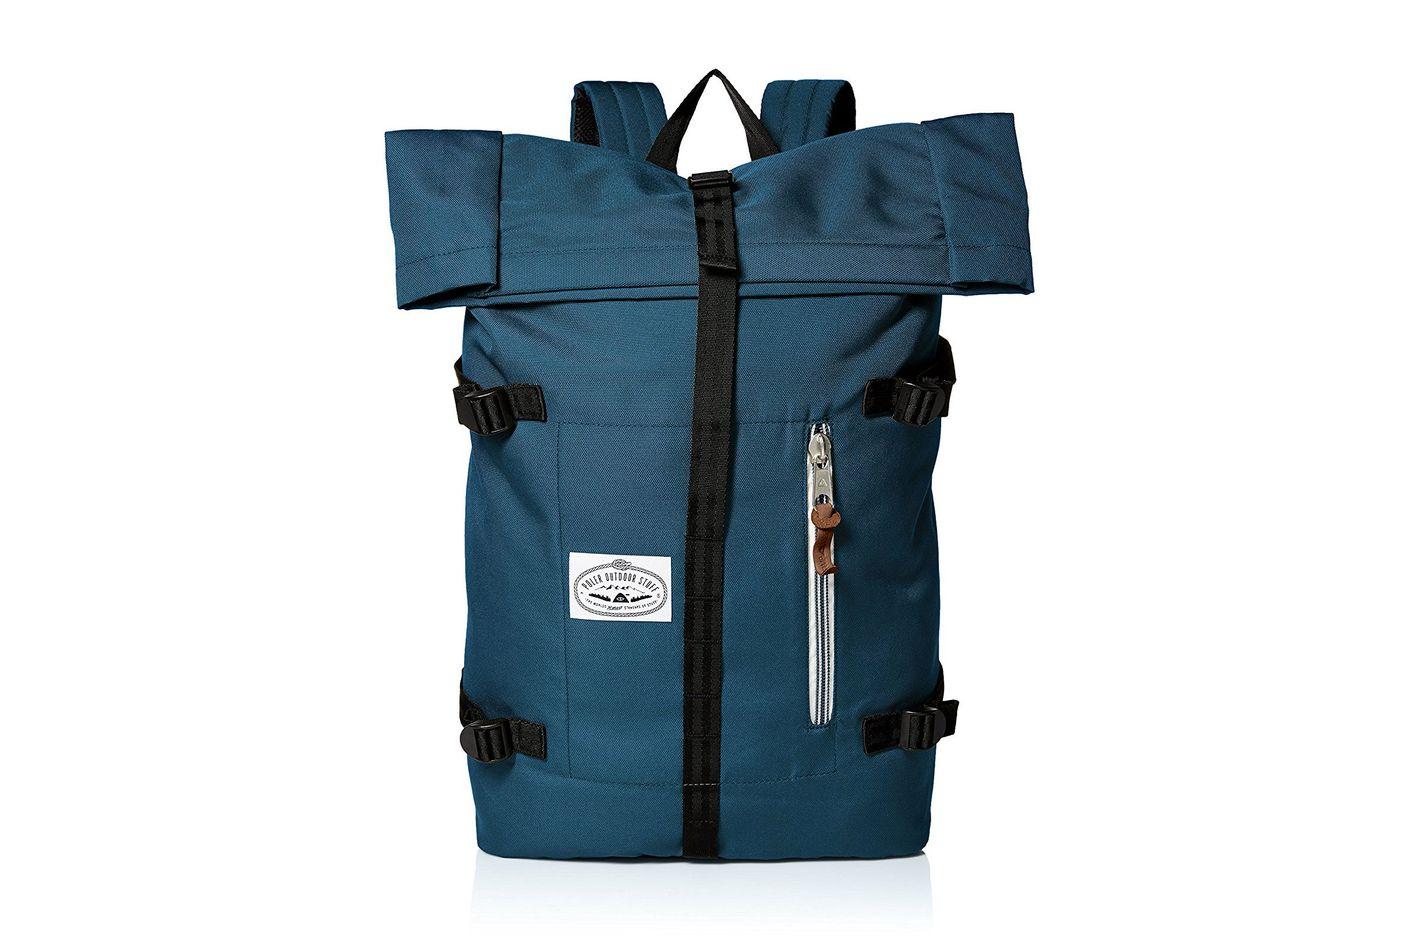 Poler Men's Classic Rolltop Bag